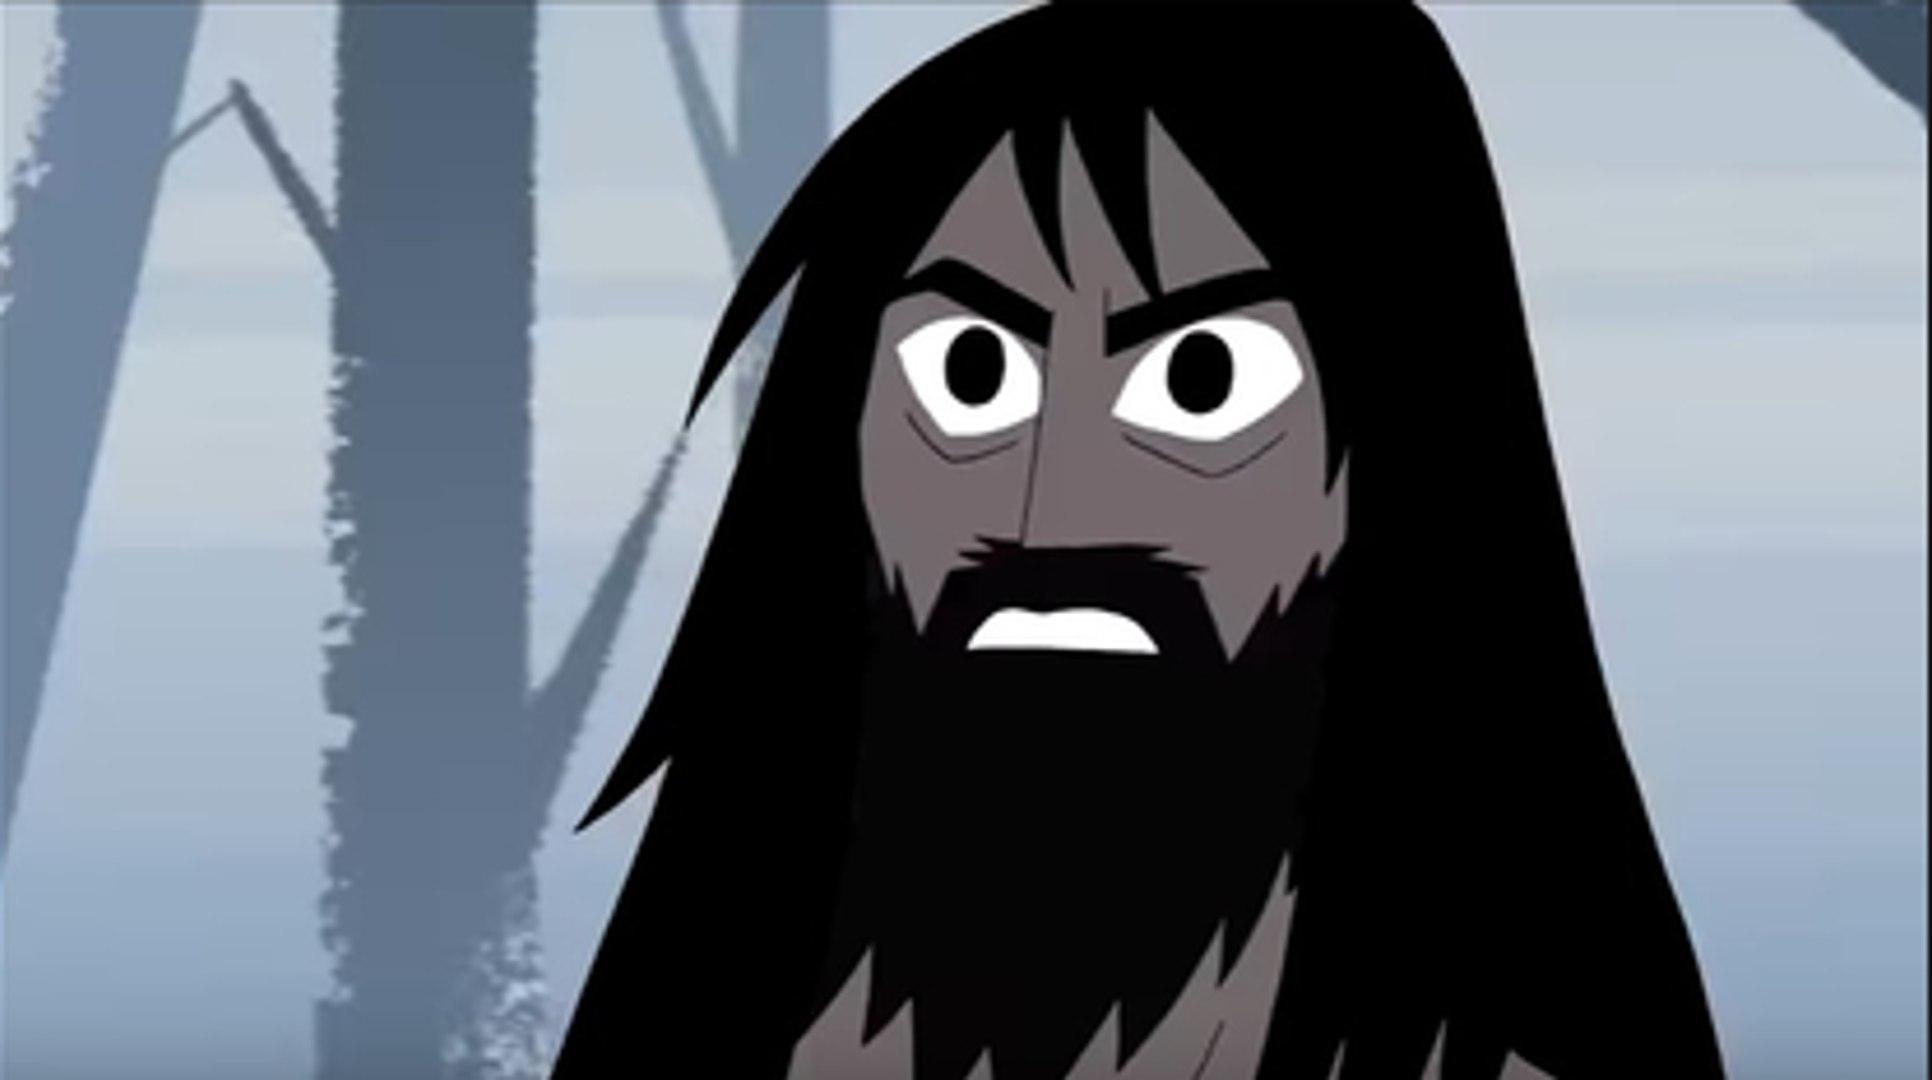 Samurai Jack Season 5 Episode 5 - Adult Swim - Full HD Free Online.